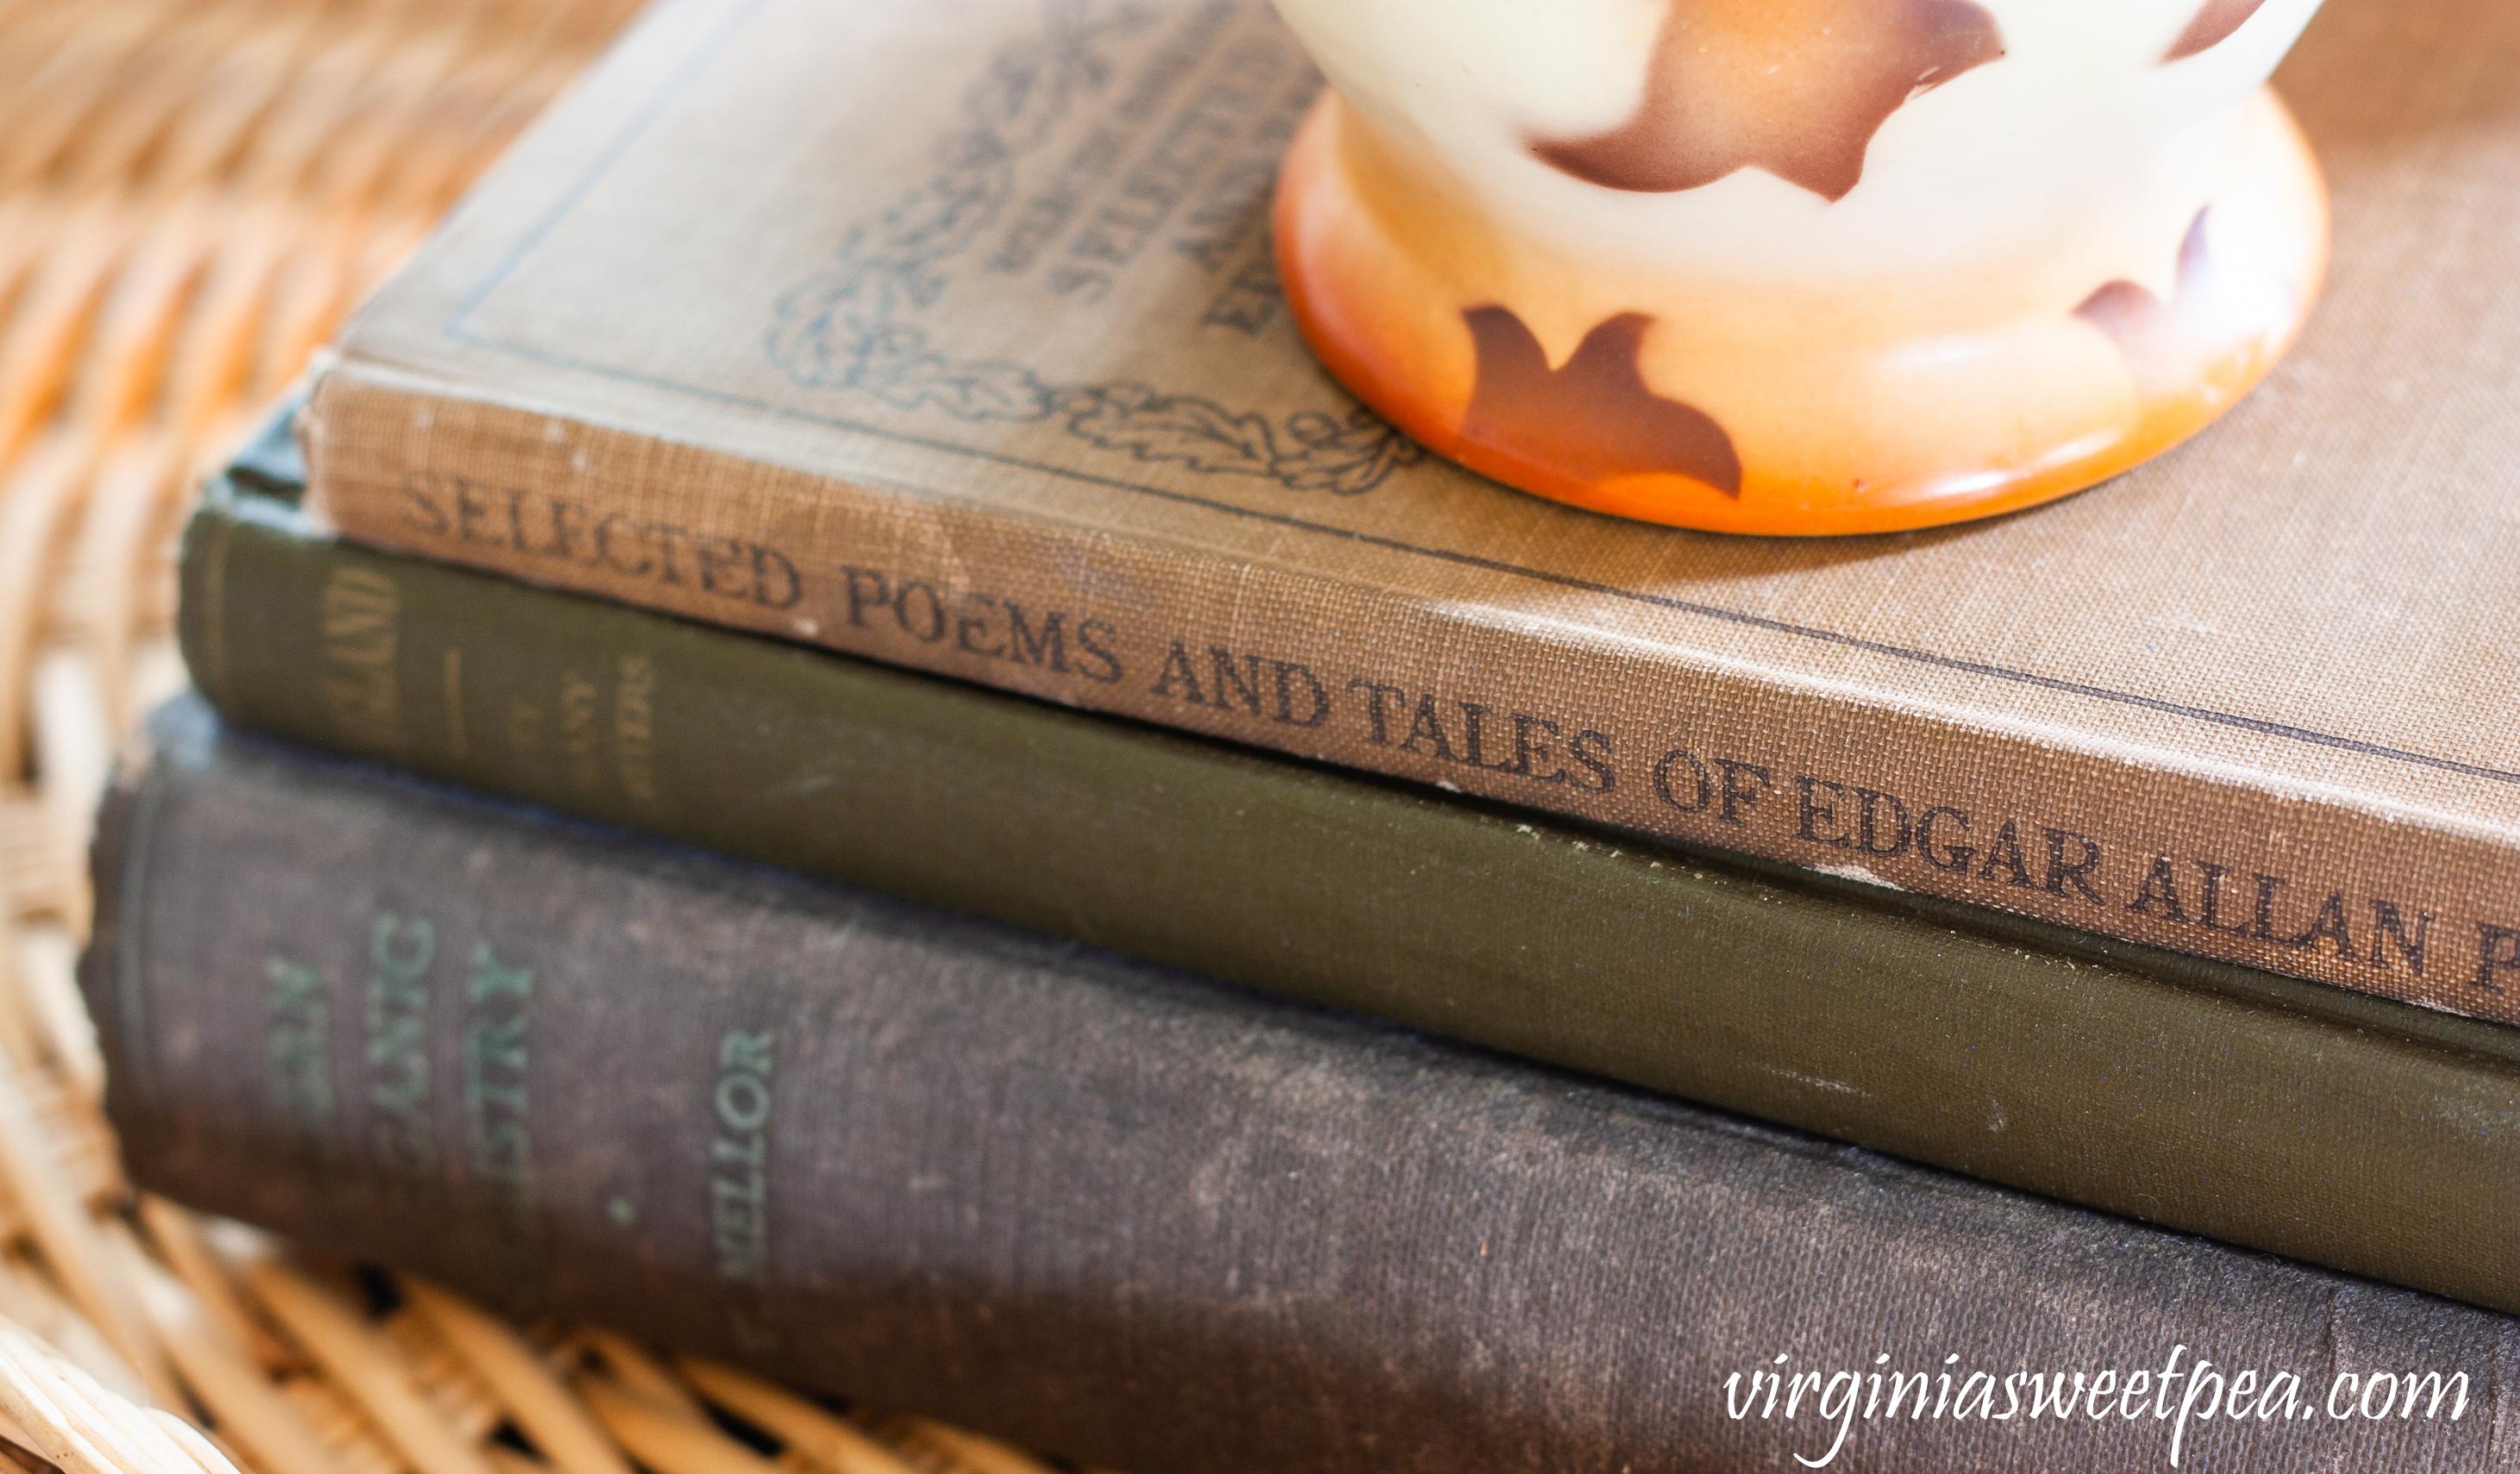 1914 Edgar Allen Poe book, 1906 England book and a 1918 Modern Inorganic Chemistry book.